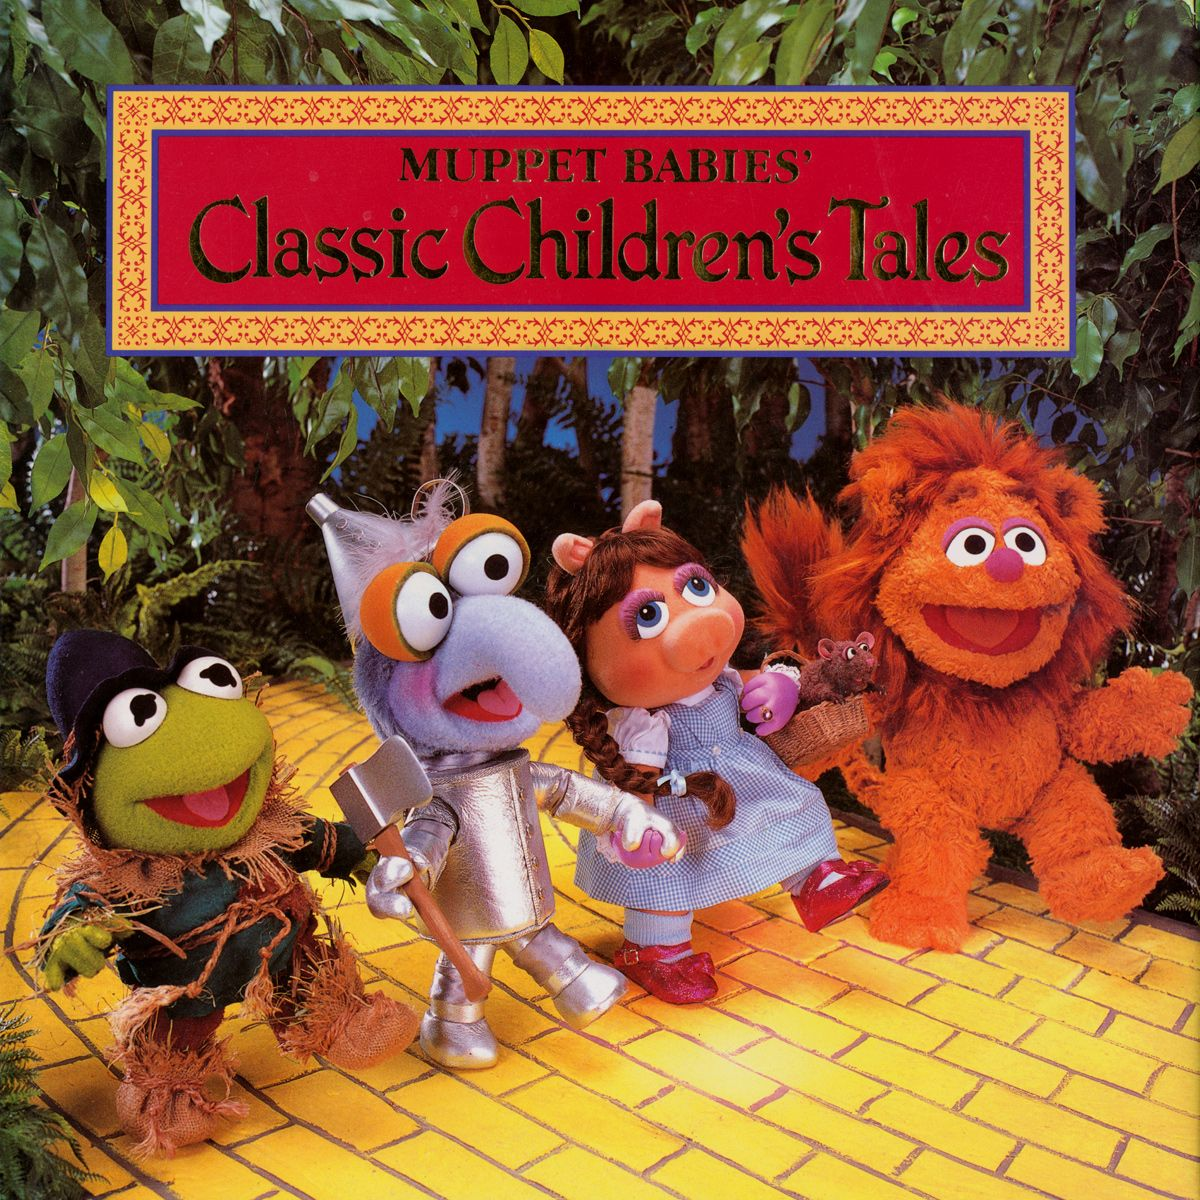 Wizard Of Oz muppet babies